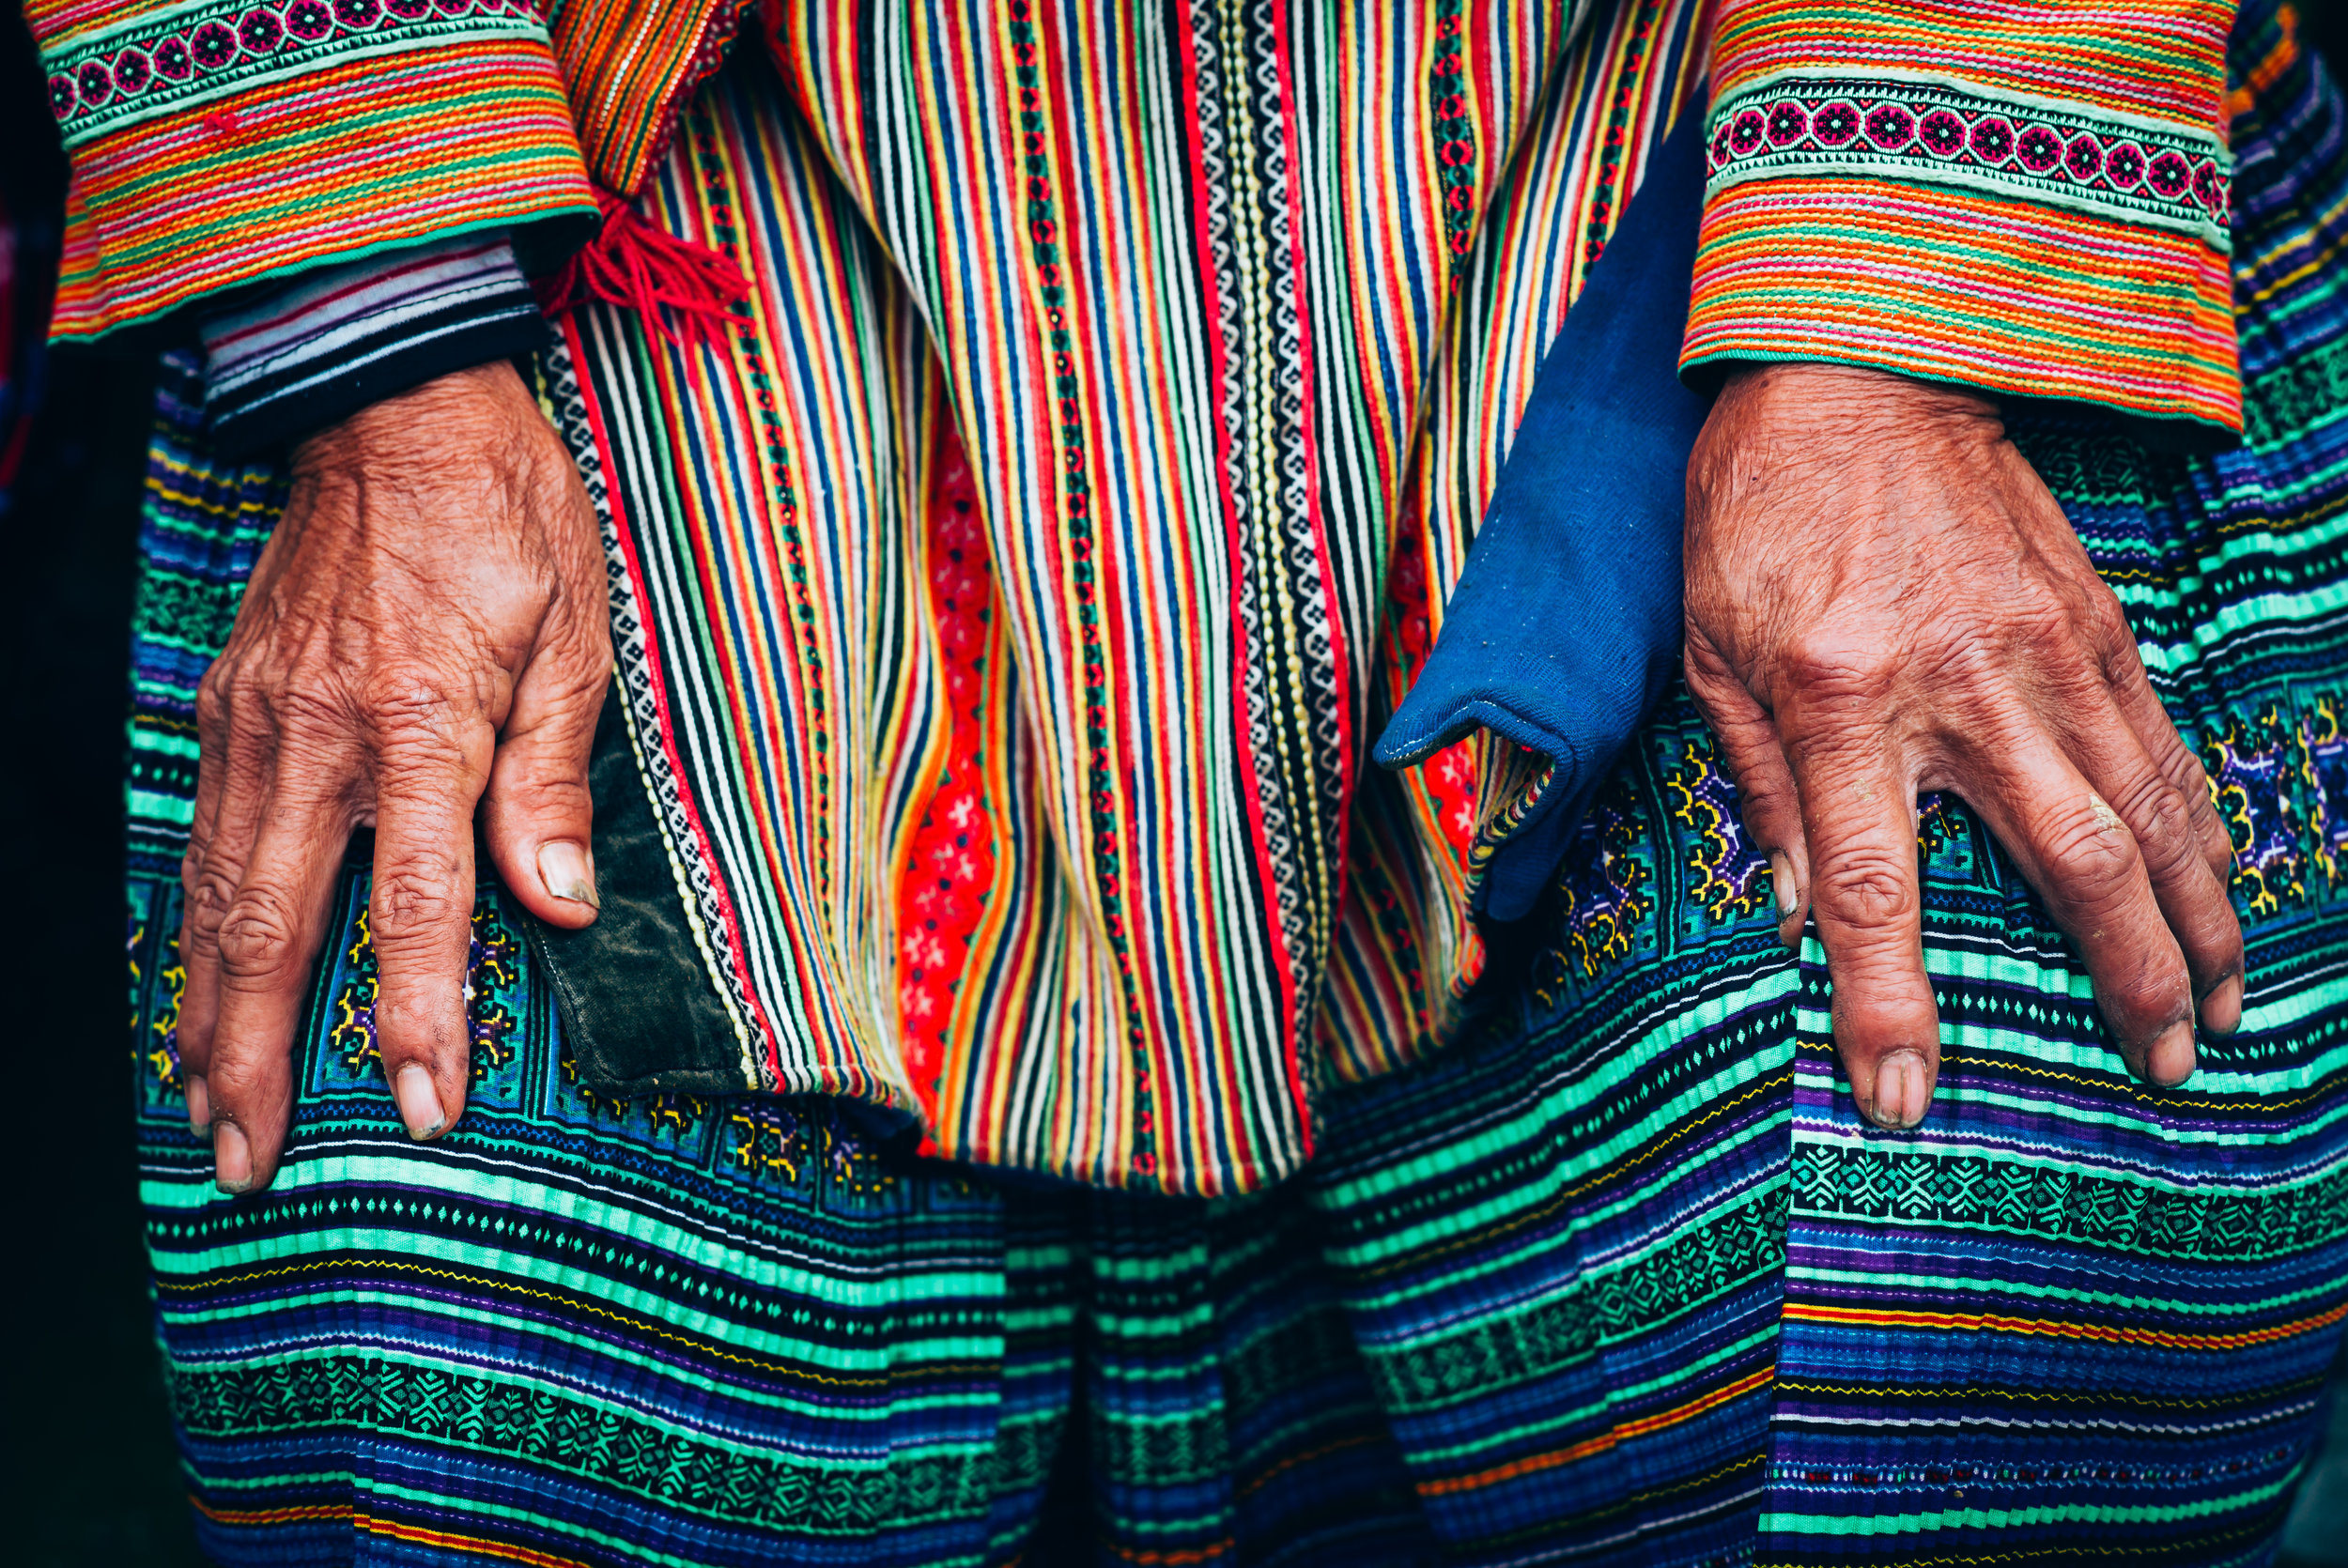 Photo: Hmong woman © sabino.parente | stock.adobe.com